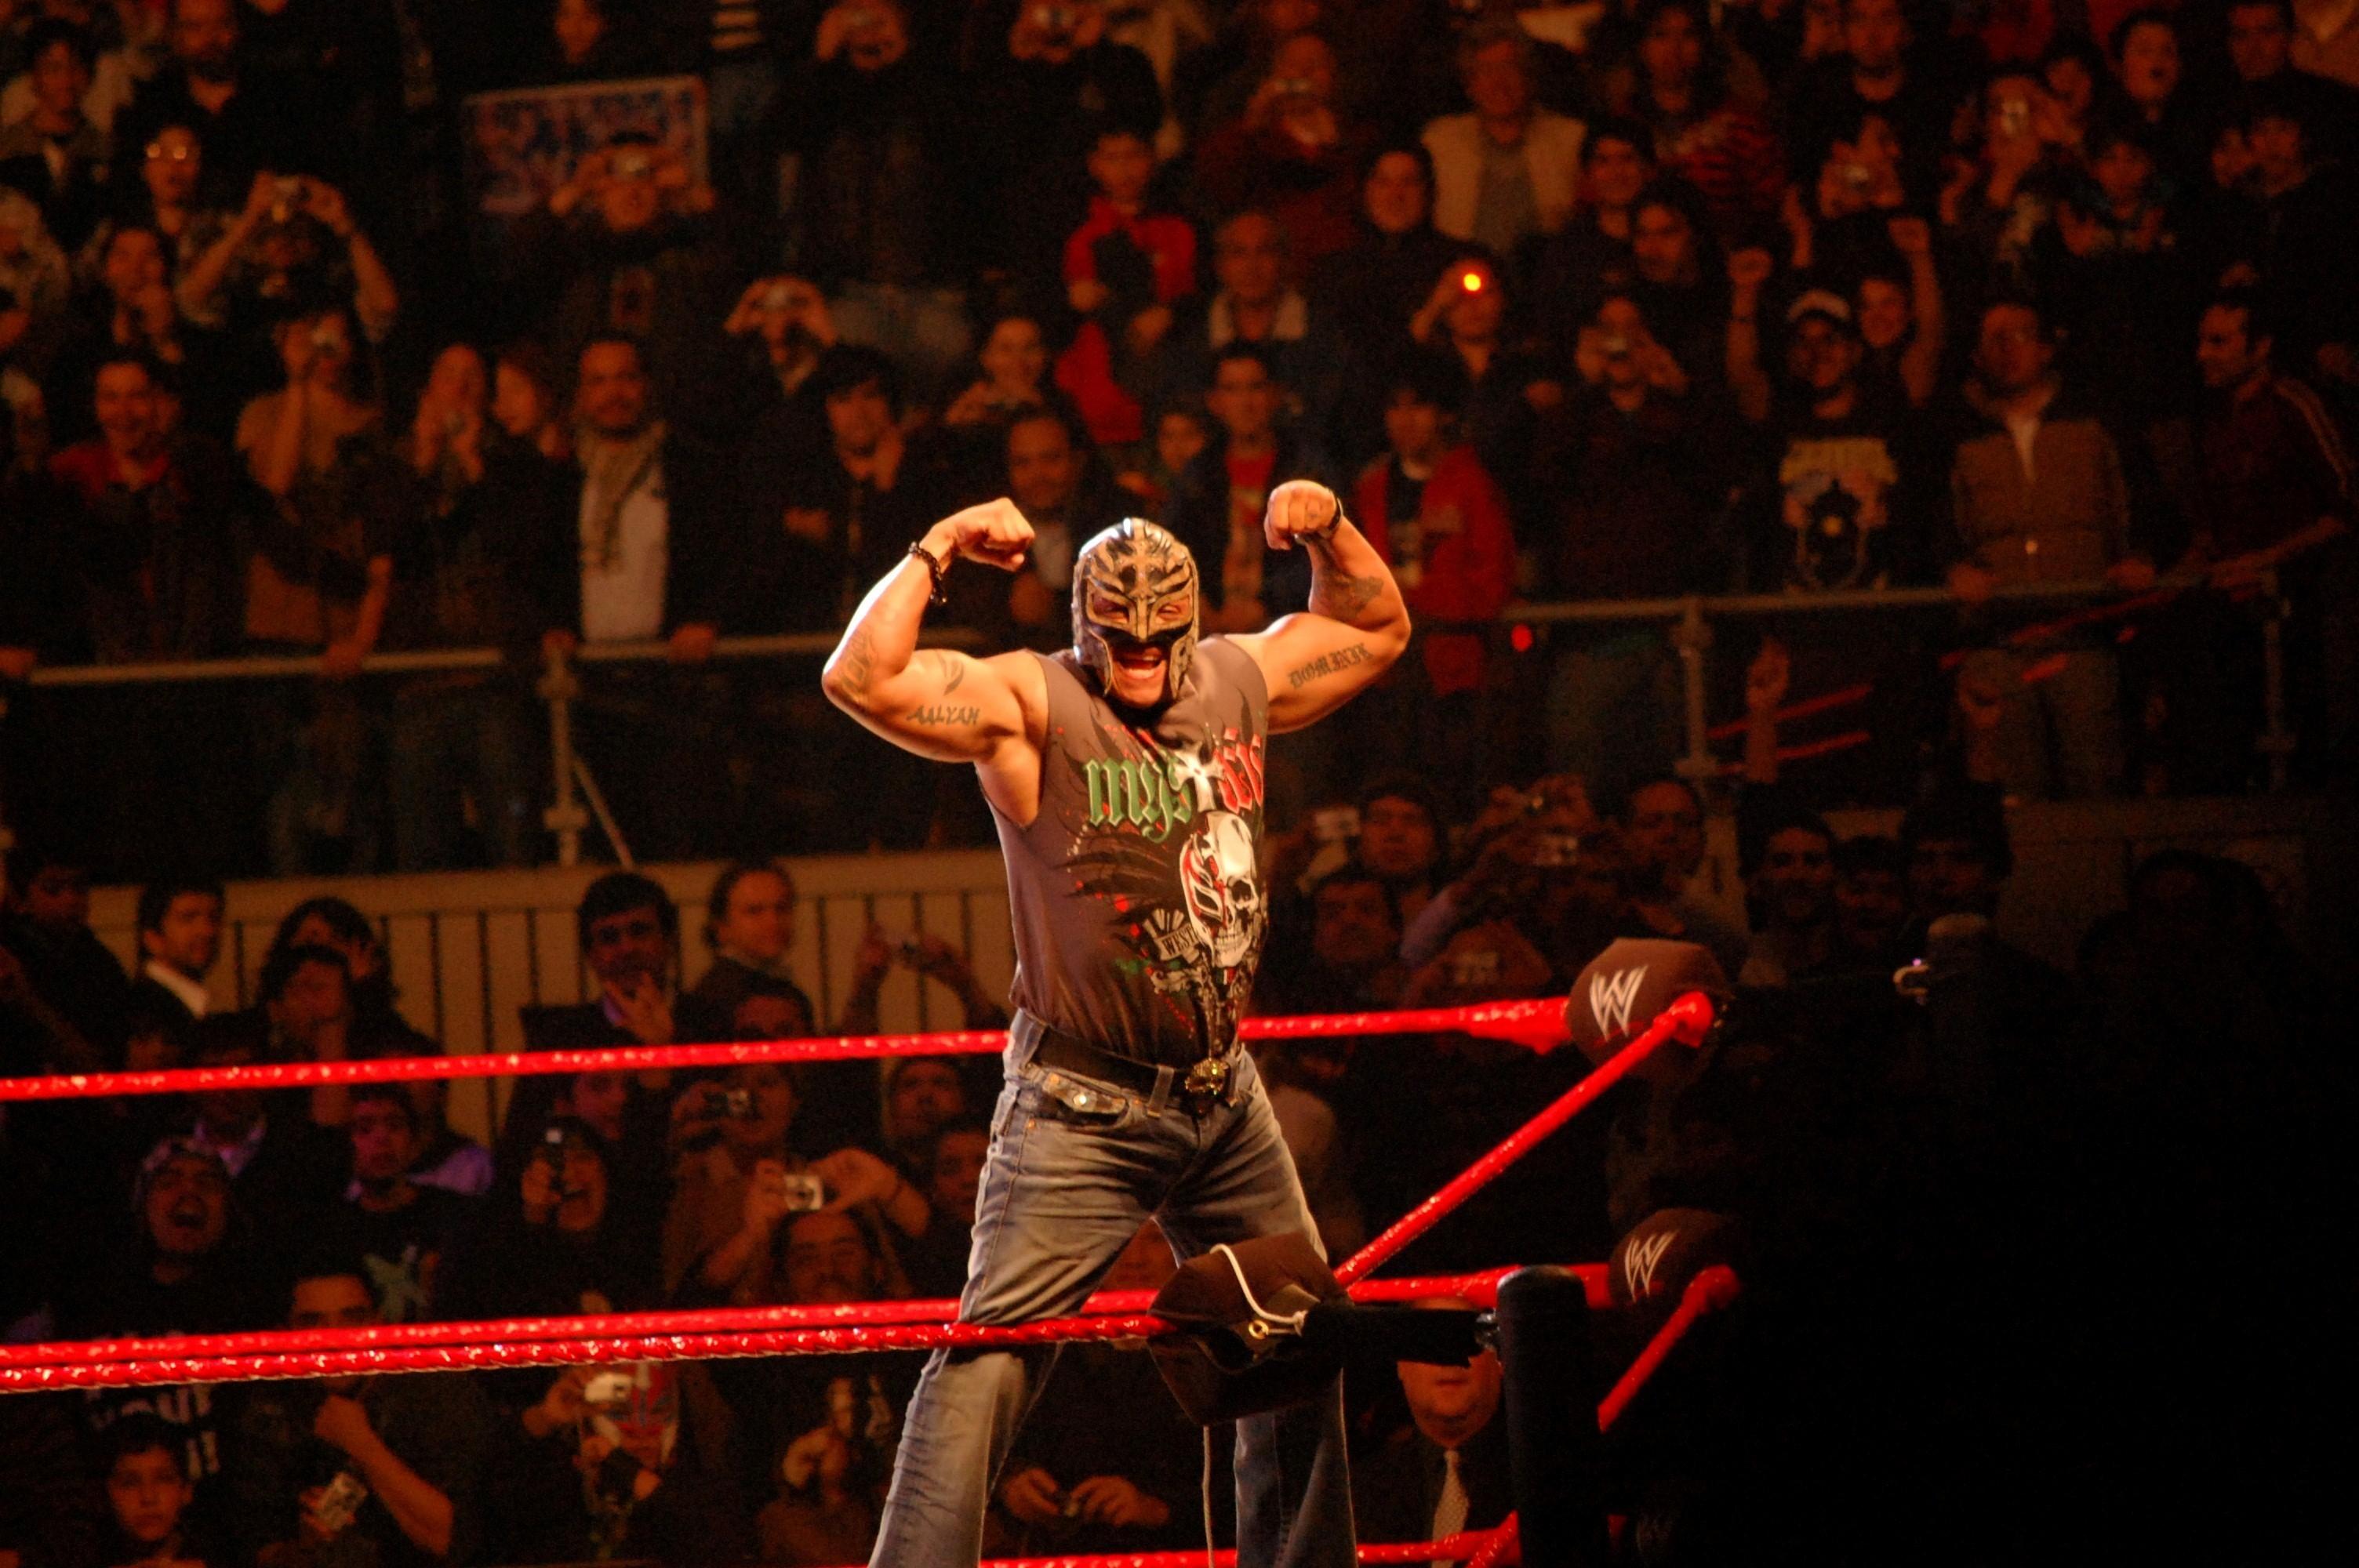 WWE Laycool HD Wallpapers 3008x2000